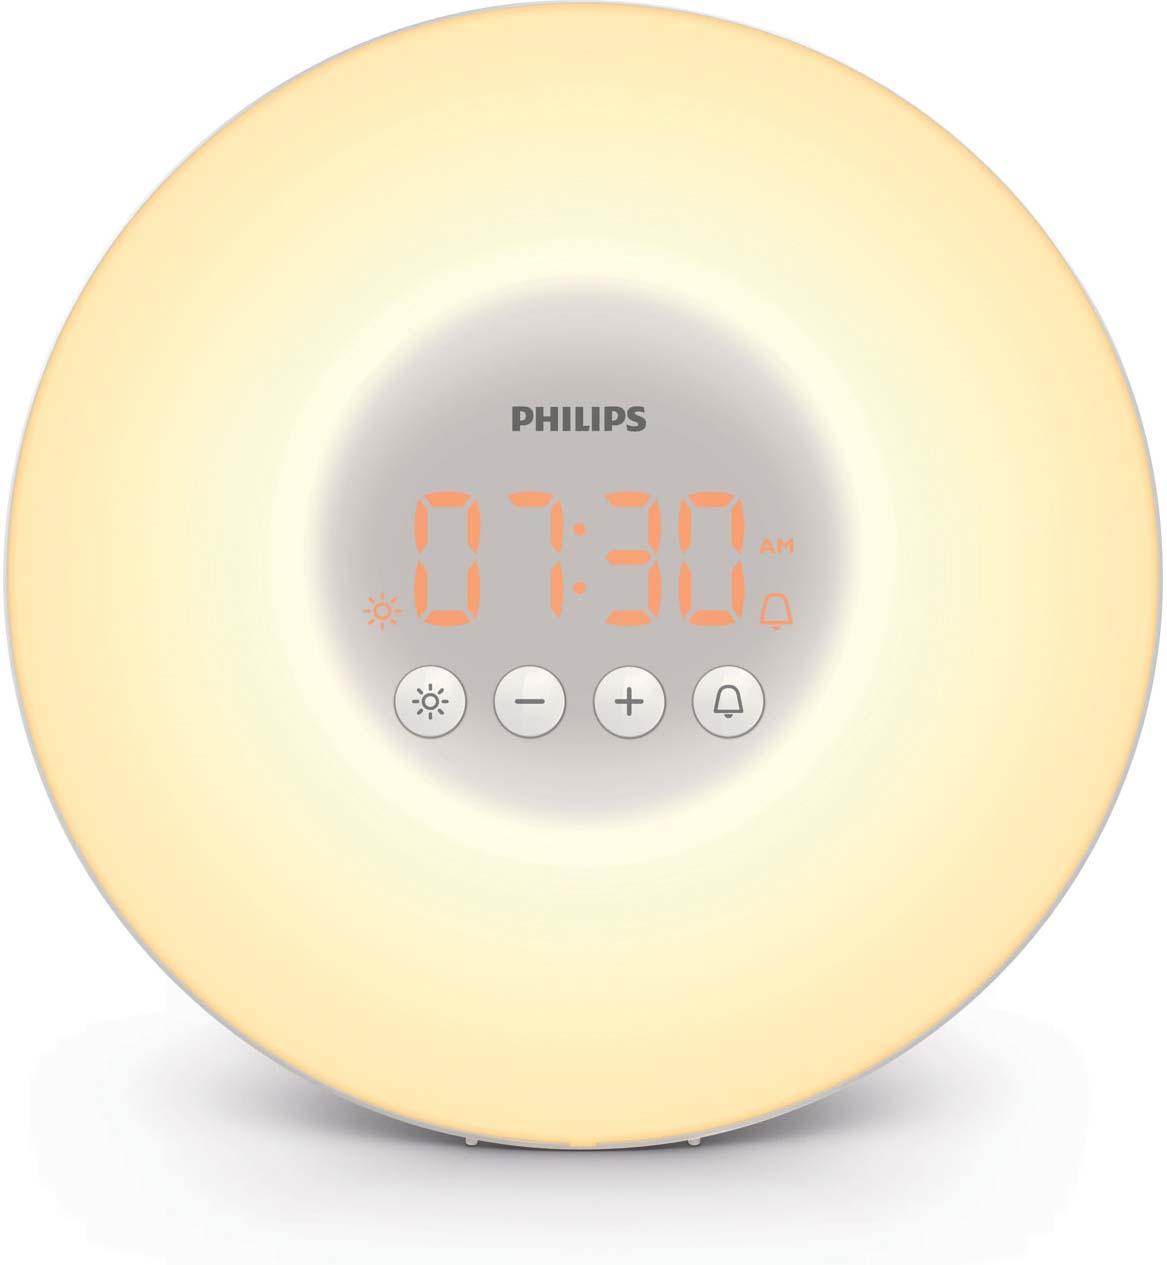 Световой будильник Philips Wake-up Light HF3500/70, белый, серый philips aj3115 12 радио будильник